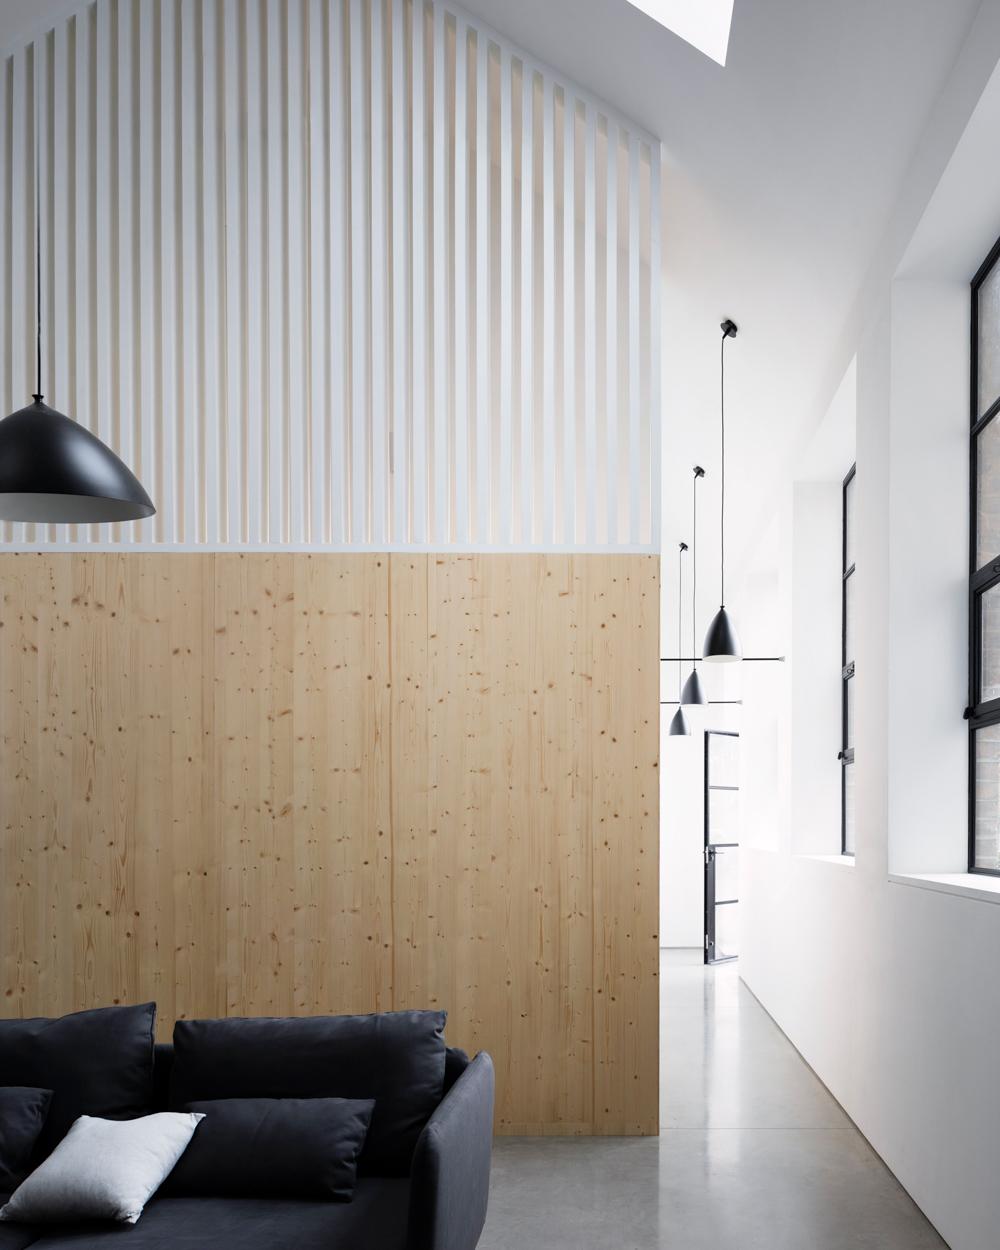 defoe-road-paper-house-project-the-design-emotive-08.jpg